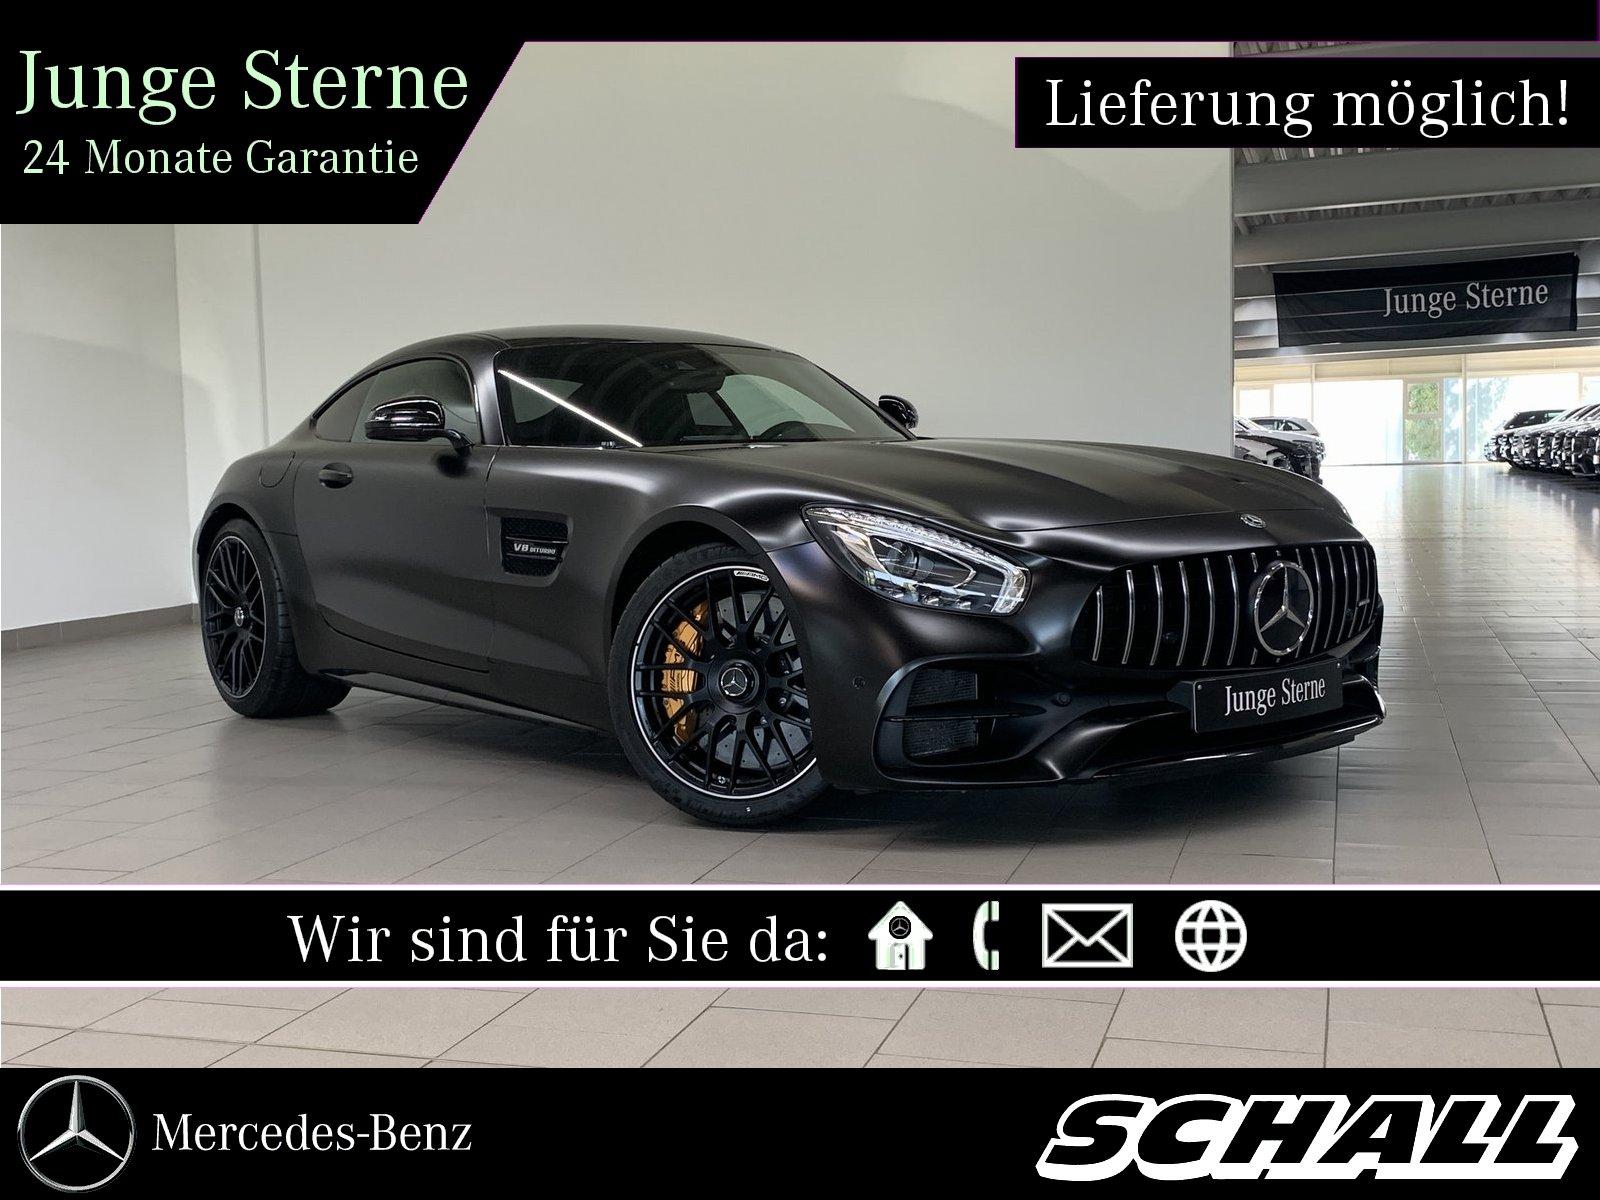 Mercedes-Benz AMG GT C KERAMIK+PERF.SITZE+PERF.ABGASANL+KAMERA, Jahr 2018, Benzin